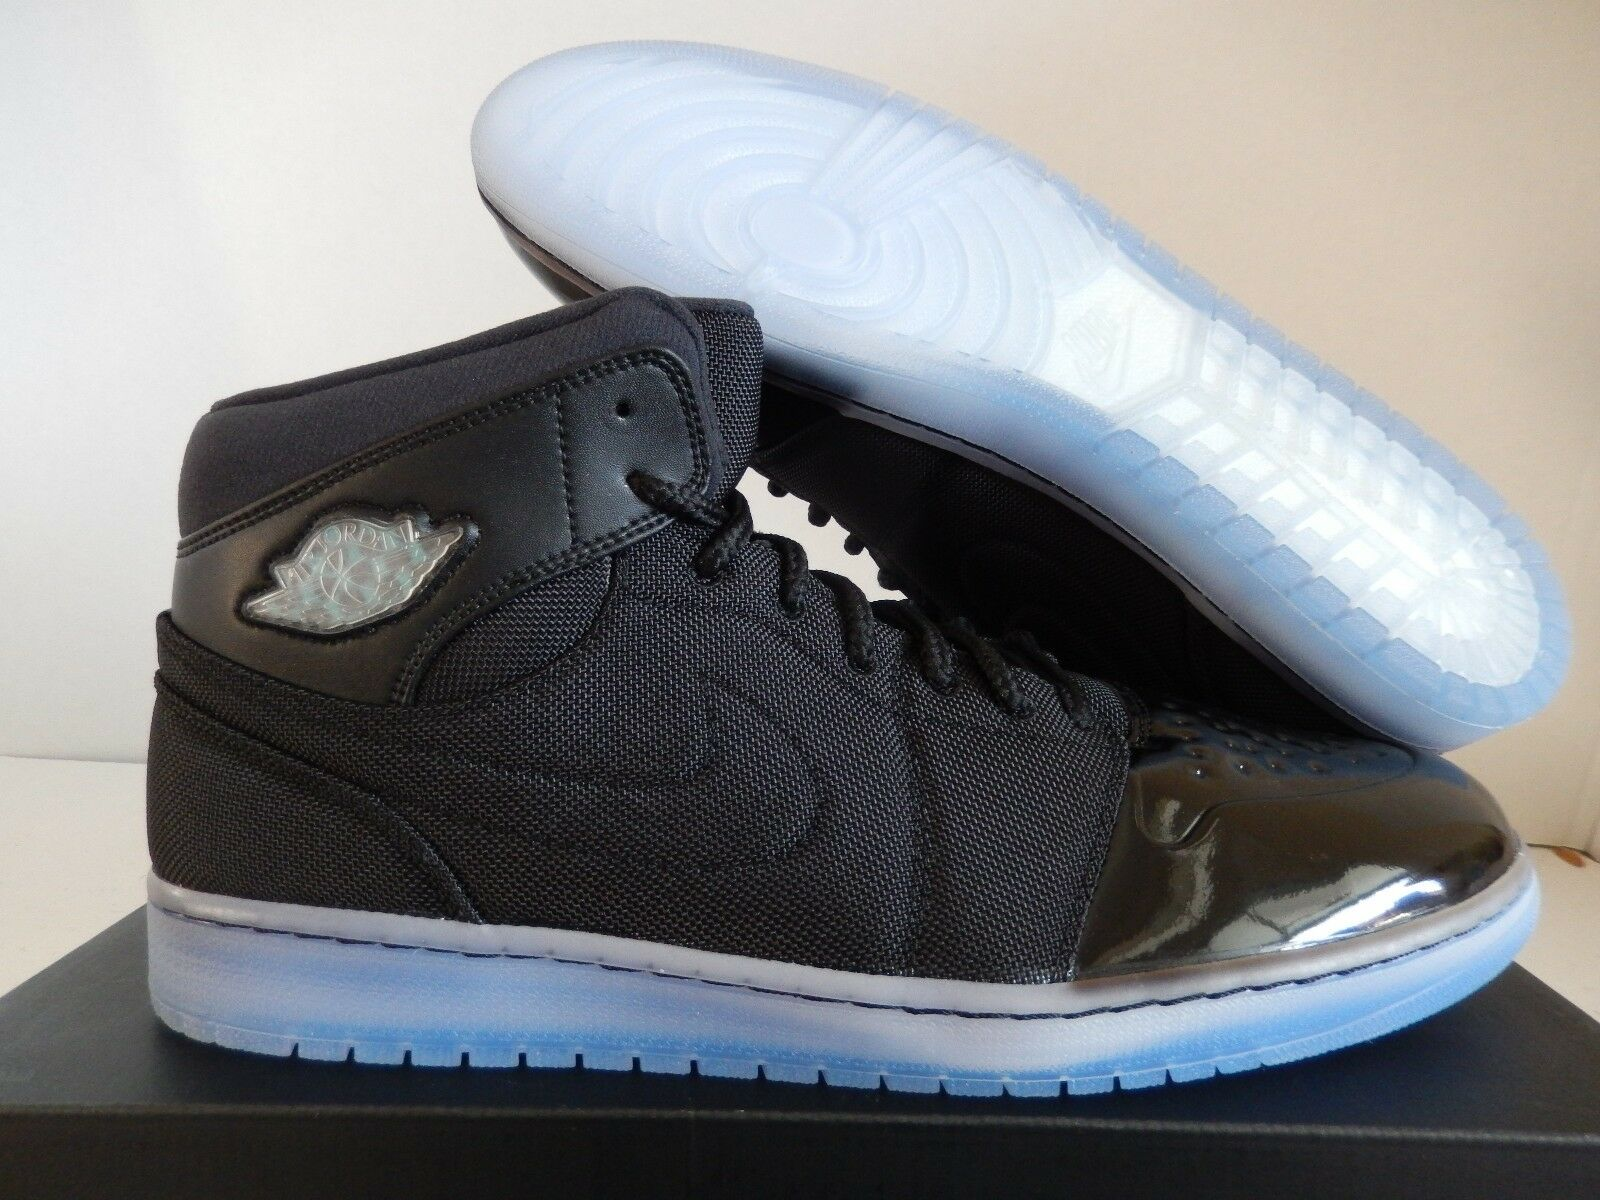 Nike air jordan 1 '95 txt nero-gamma blue-varsity mais sz 15 [616369-089]